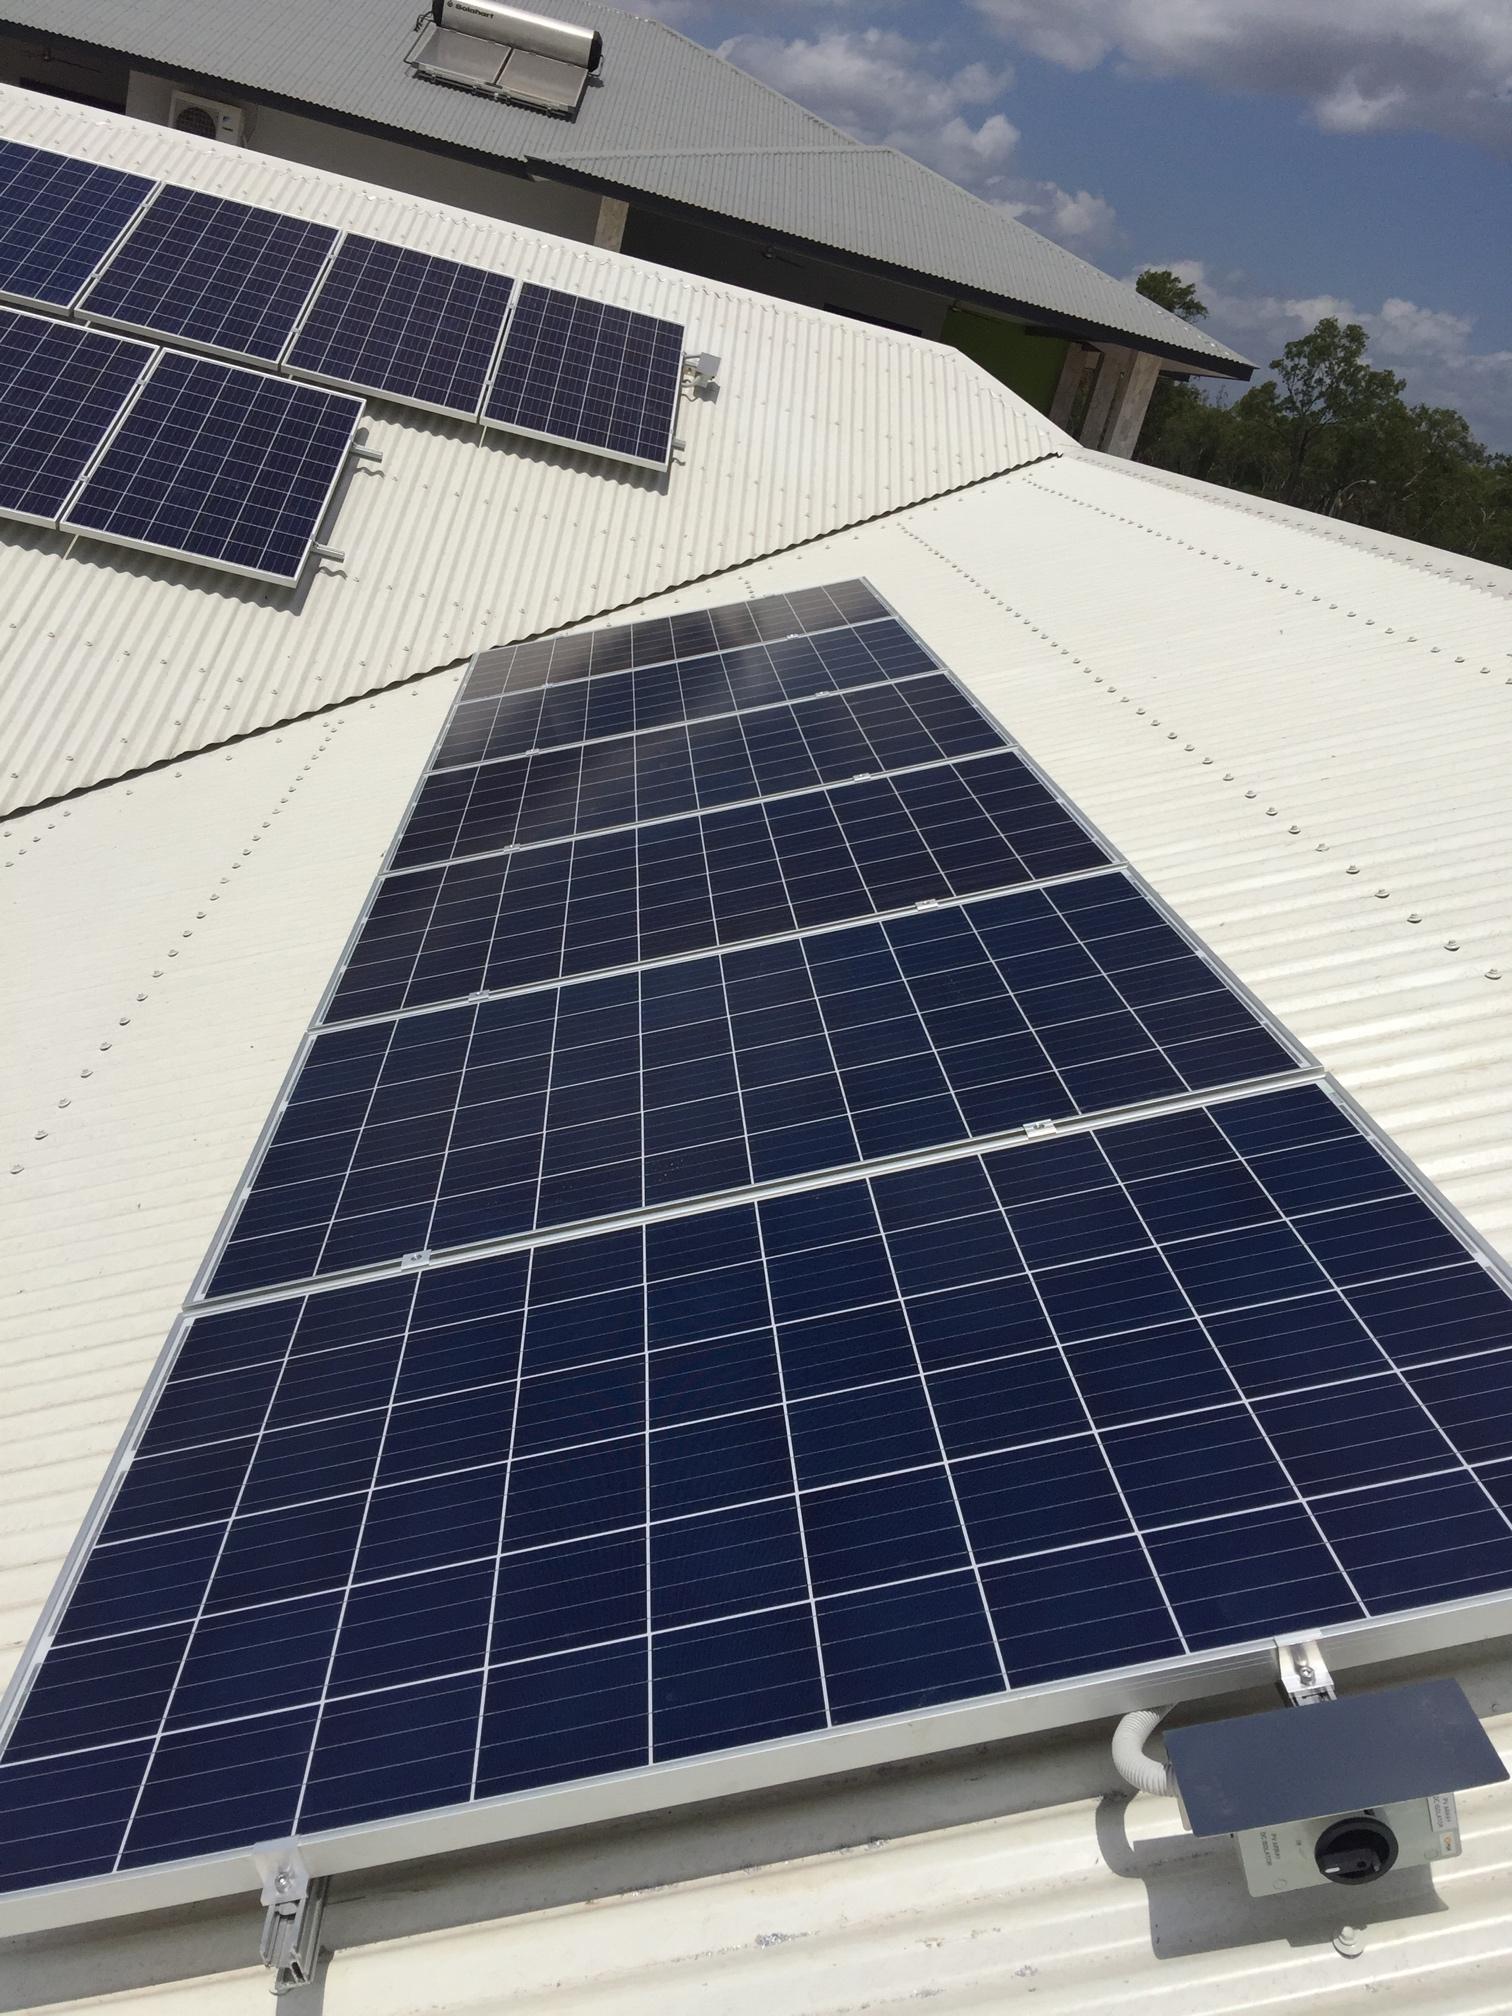 nyc solar installer quixotic systems designs vertical - HD1512×2016